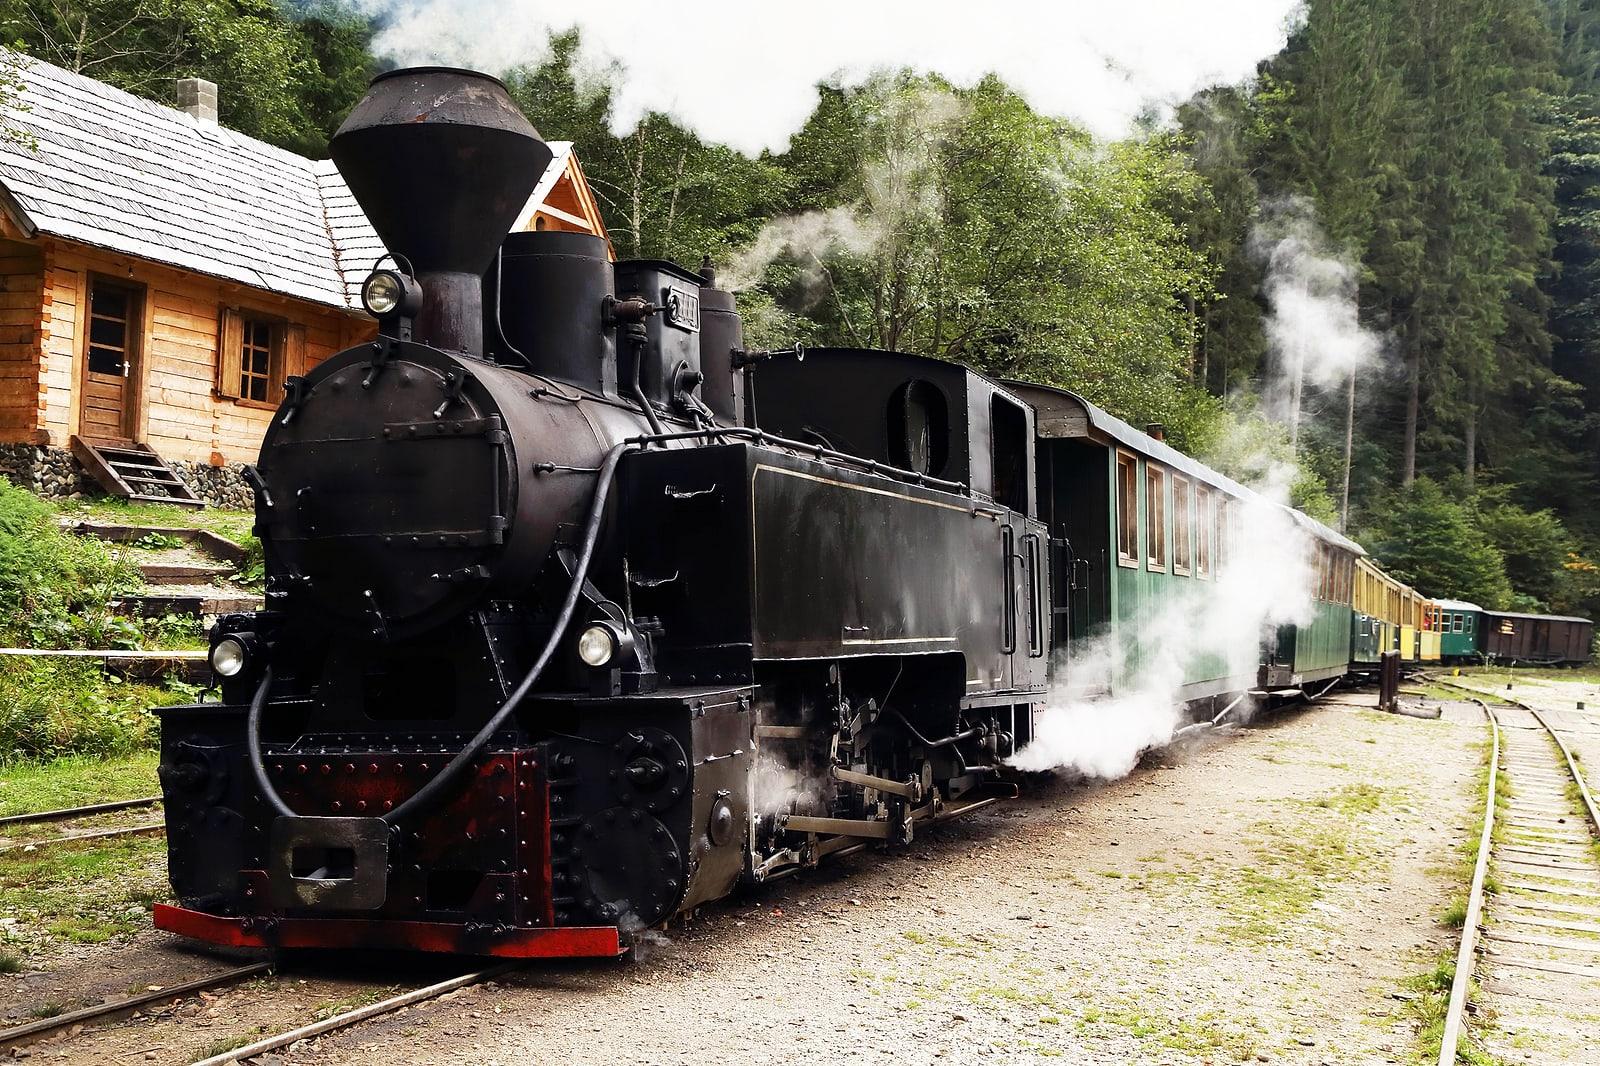 Mocanita touristic train - The last forestry steam working train